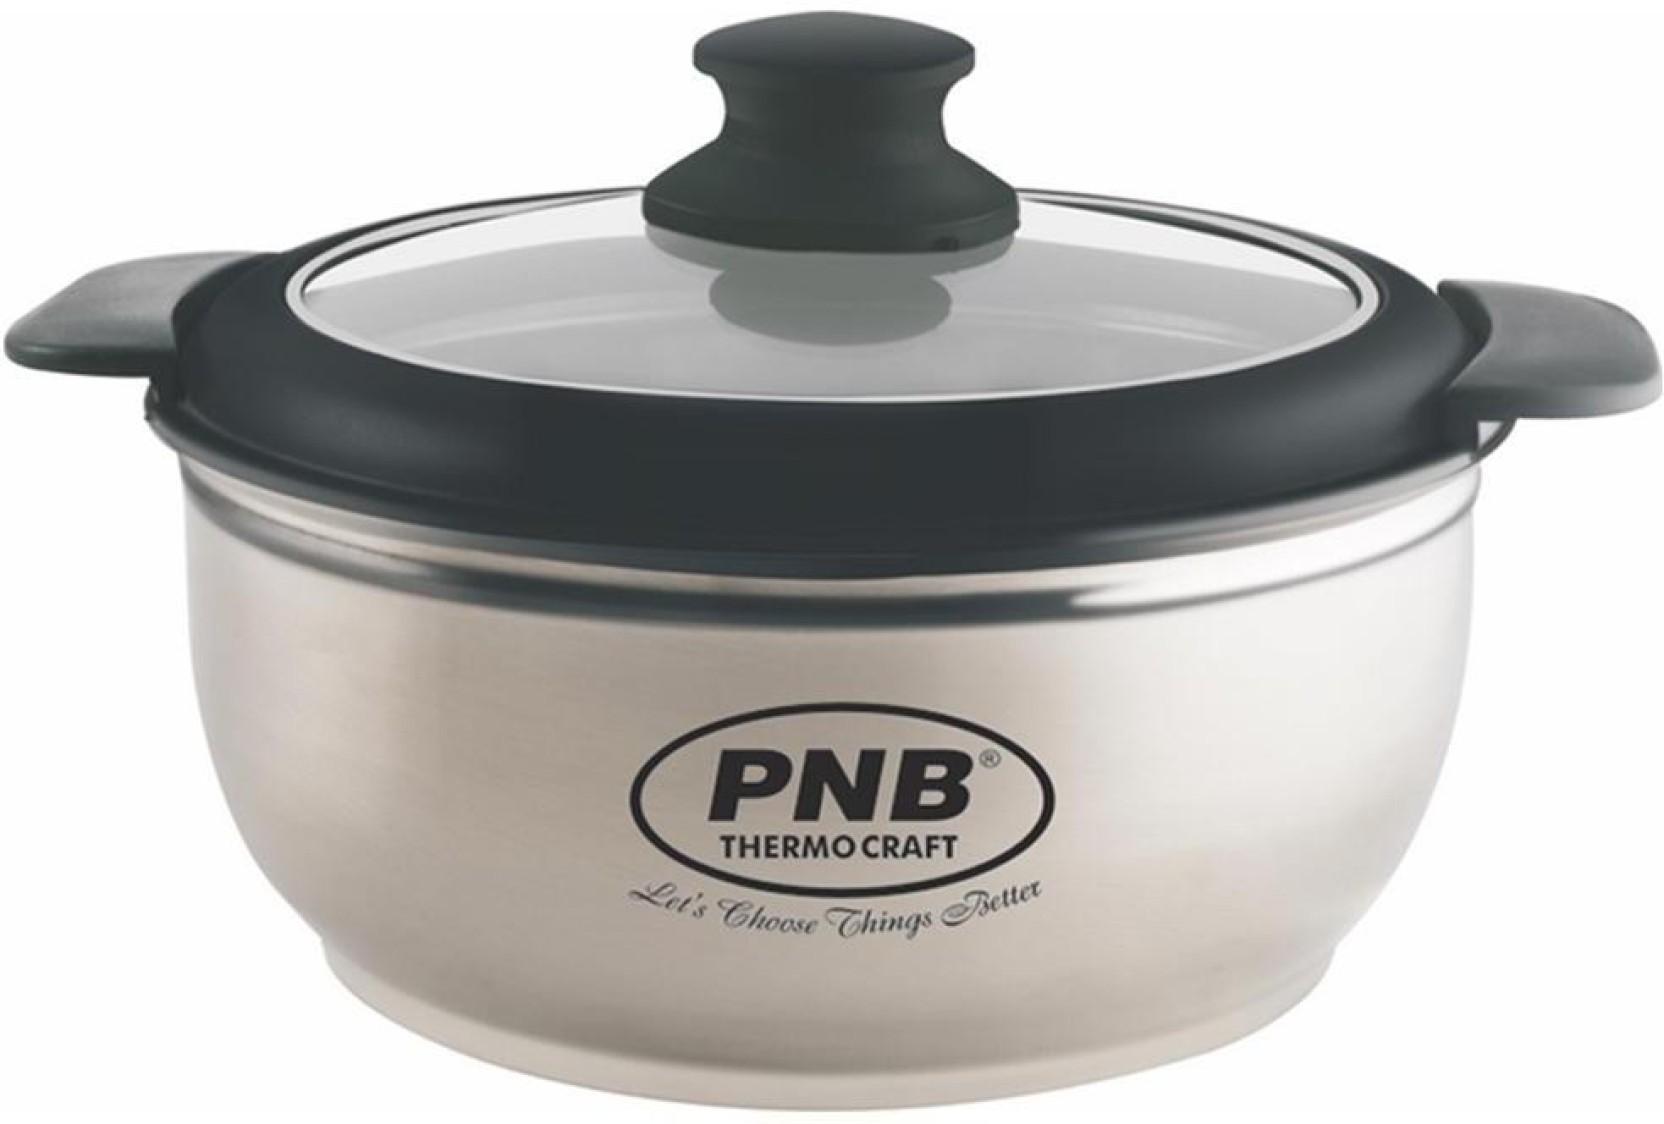 d080a6f4aab PNB Casserole Price in India - Buy PNB Casserole online at Flipkart.com